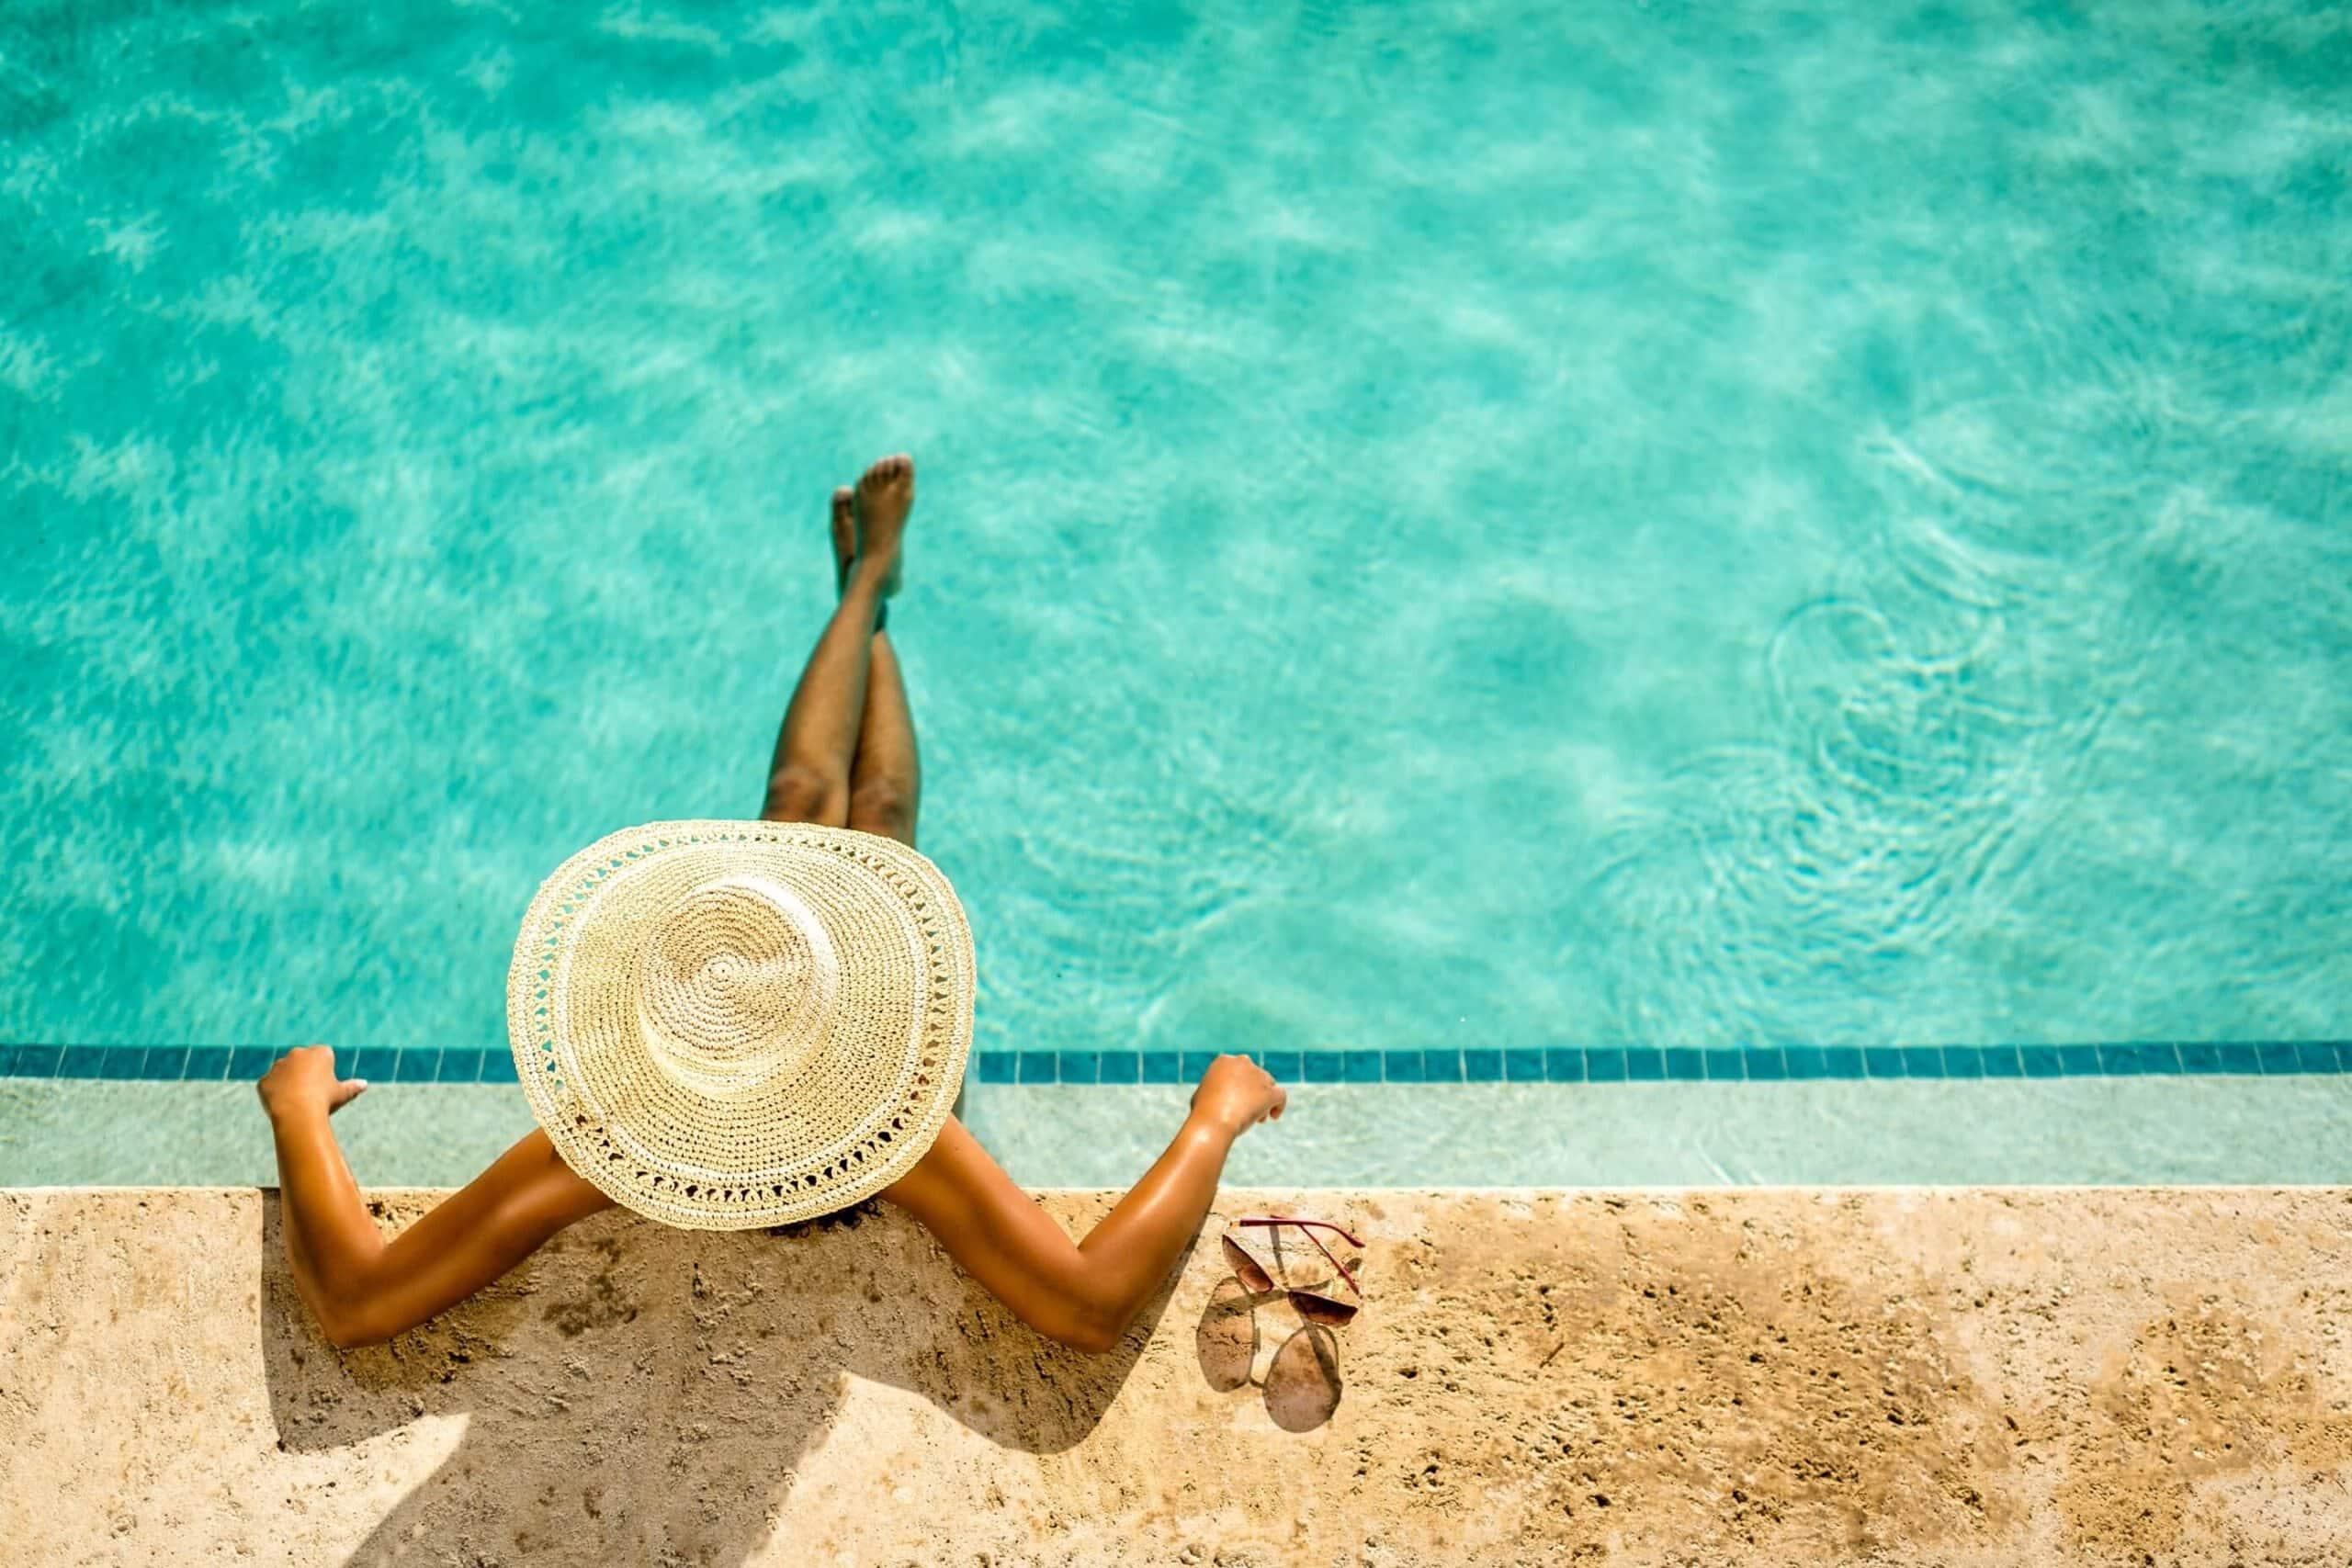 Credit Visit Lauderdale LauderDeals Aerial view pool scaled